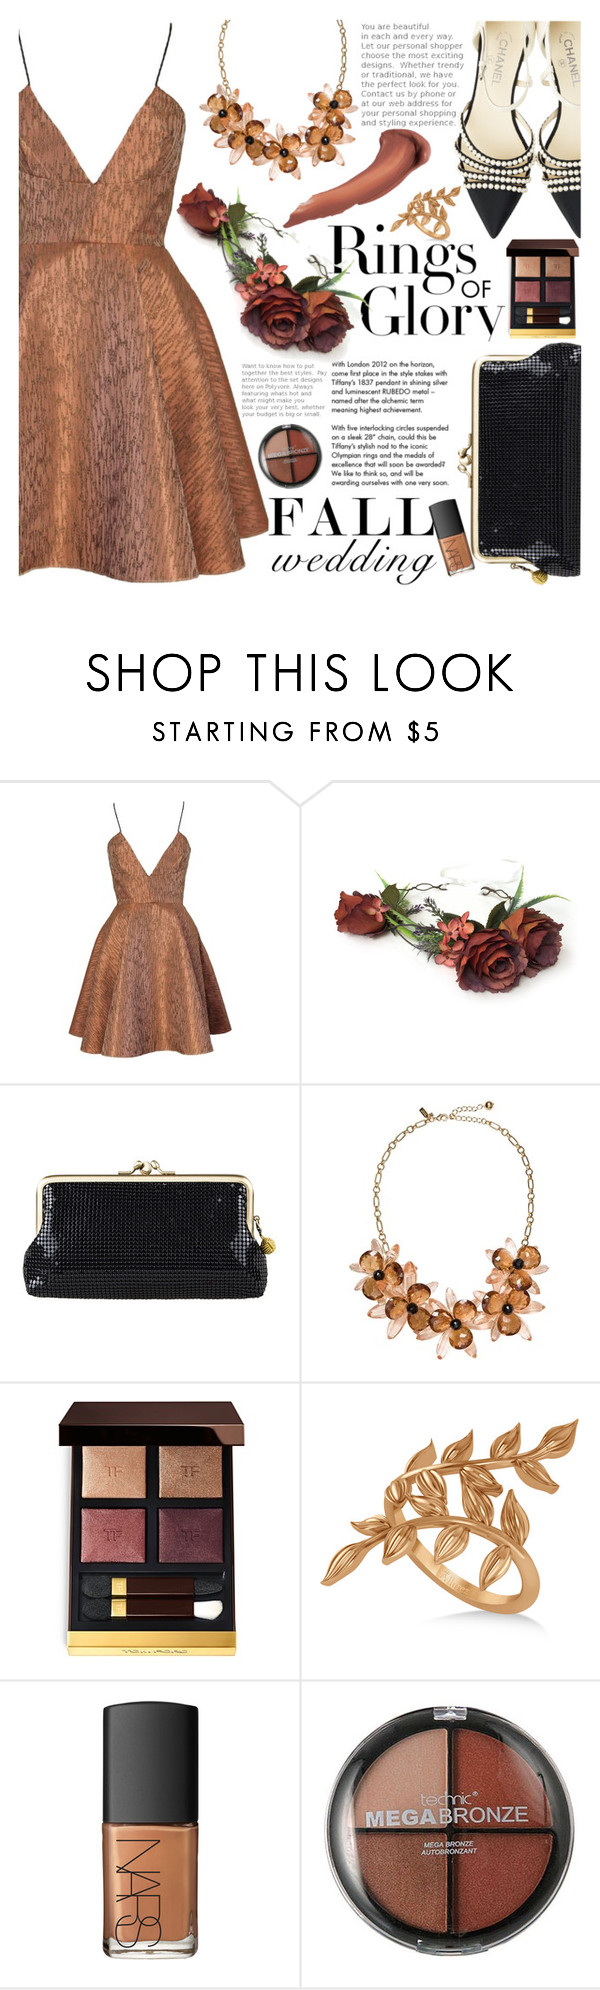 """Fall Wedding"" by martinabb ❤ liked on Polyvore featuring Tiffany & Co., Joana Almagro, Kate Spade, Tom Ford, Allurez, NARS Cosmetics, Boohoo, Anastasia Beverly Hills, Chanel and fallwedding"